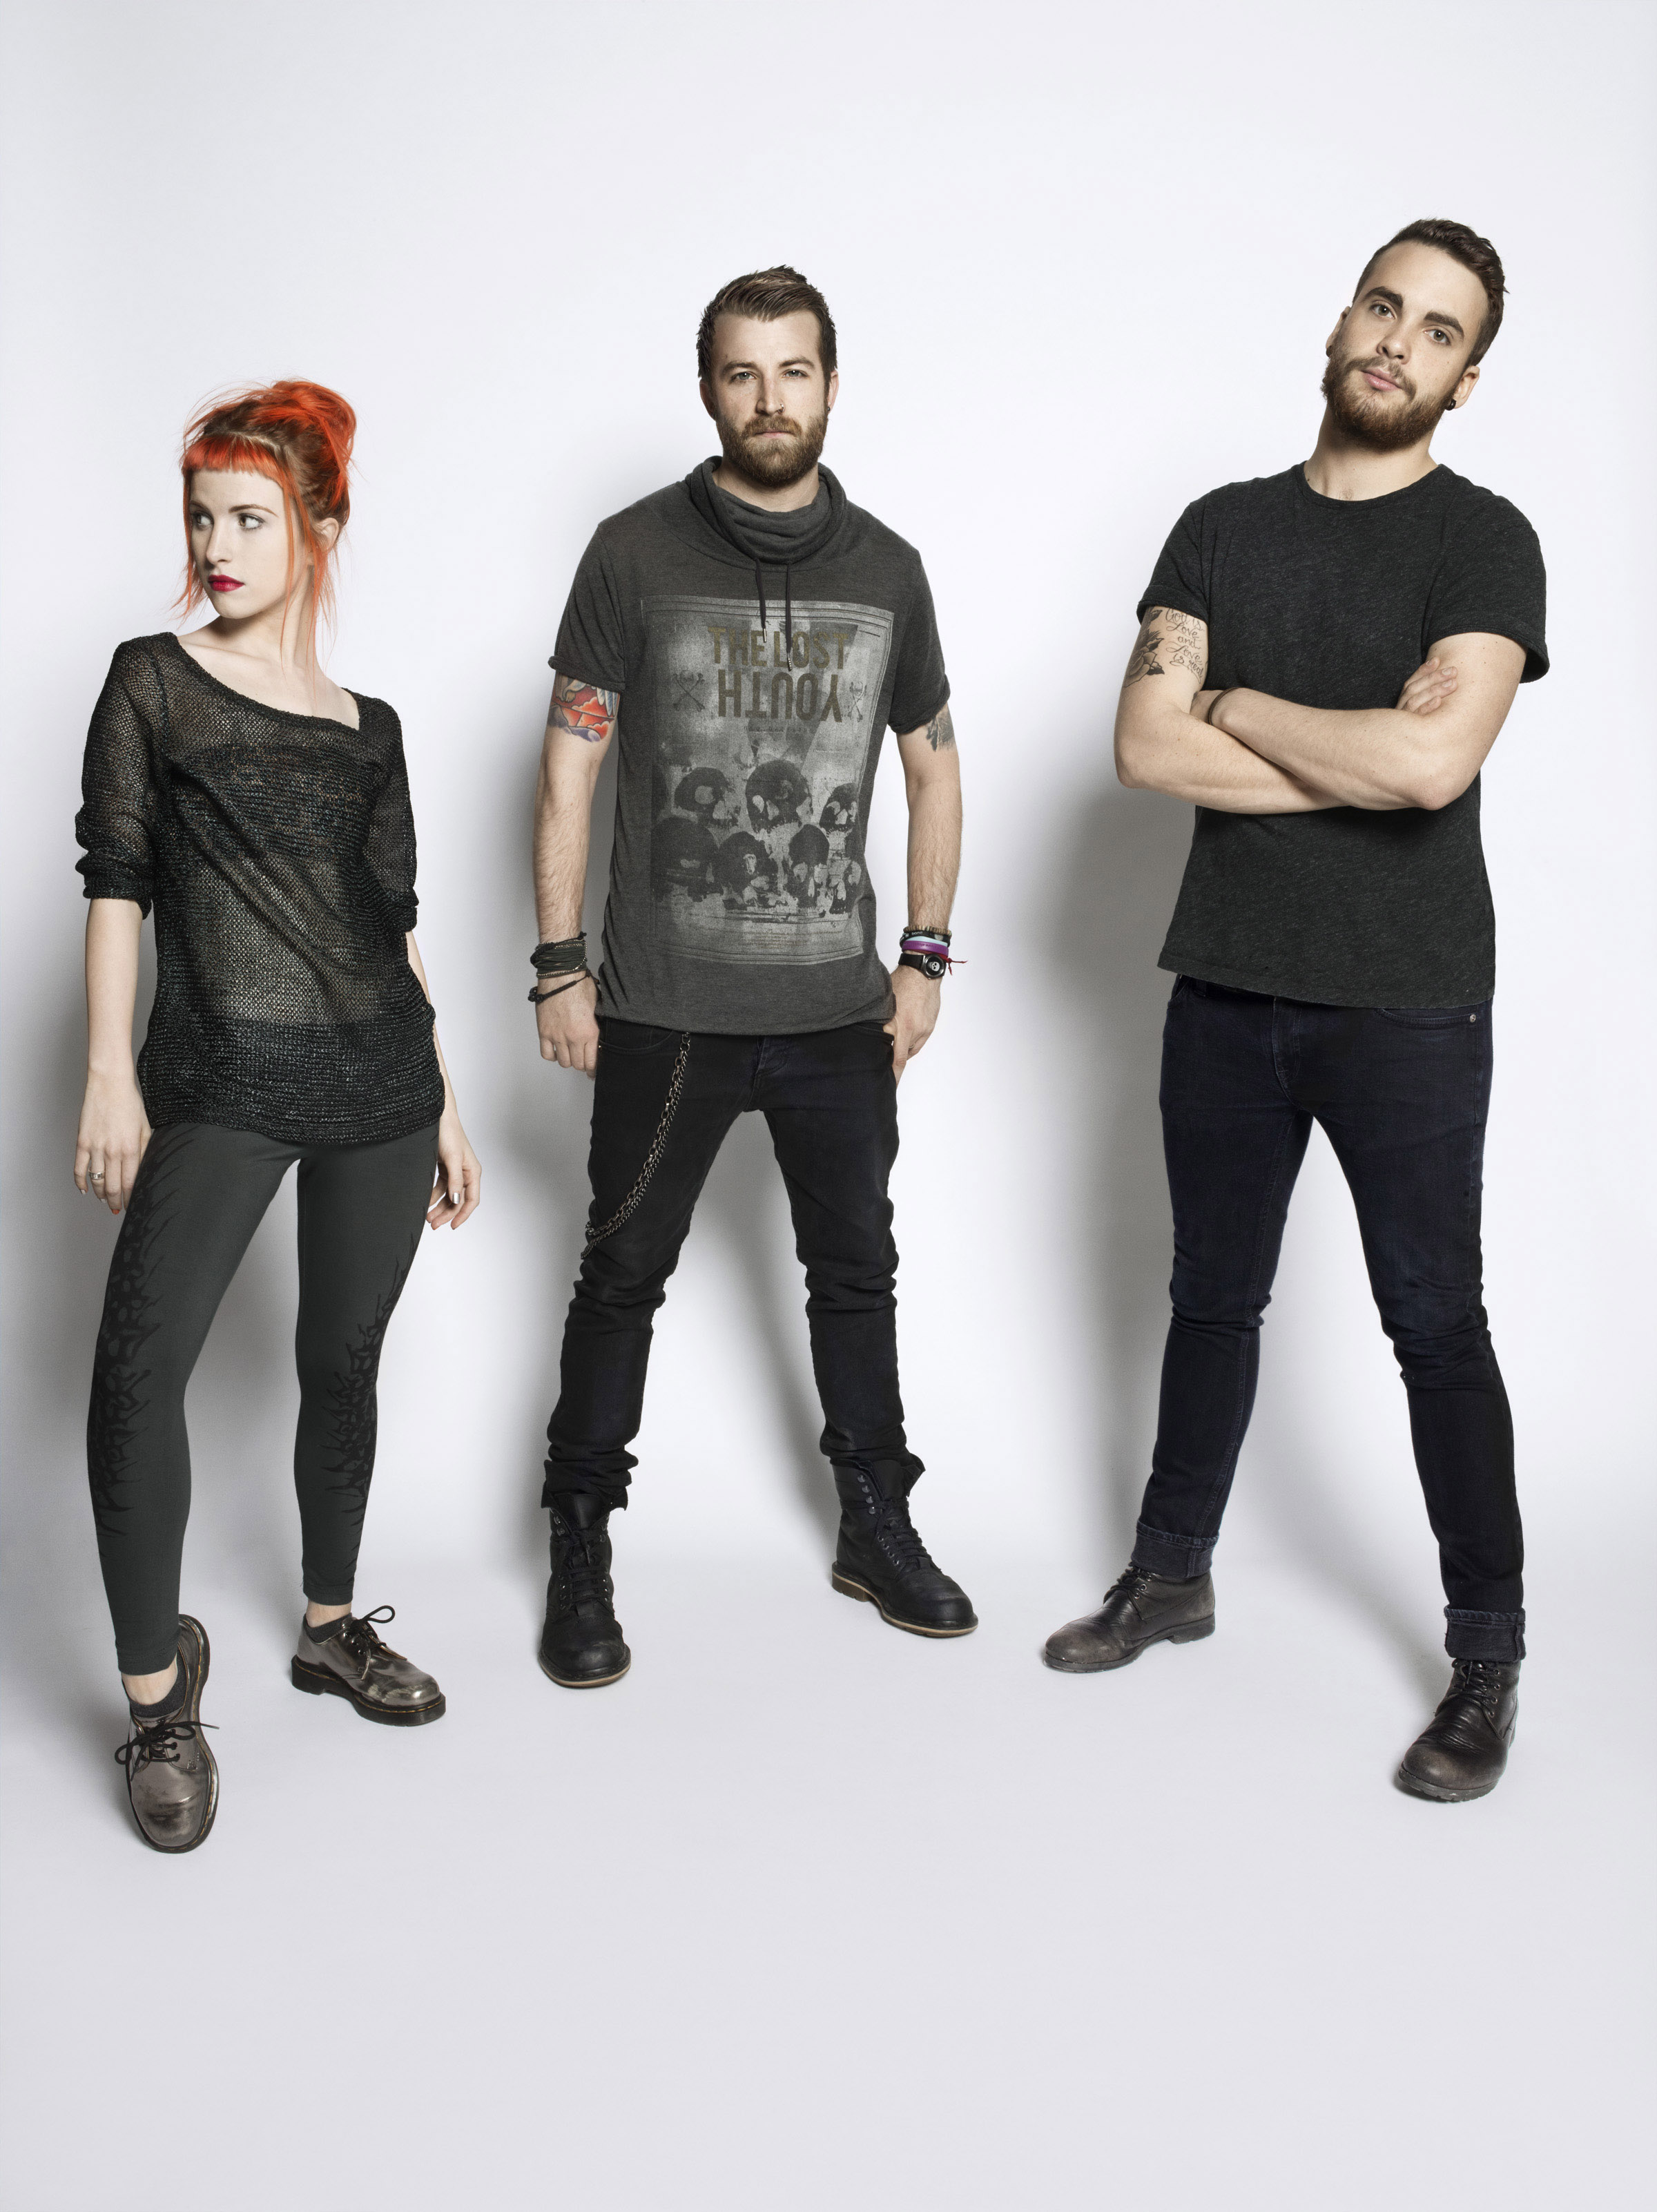 Concert review: Paramore, Vector Arena - NZ Herald